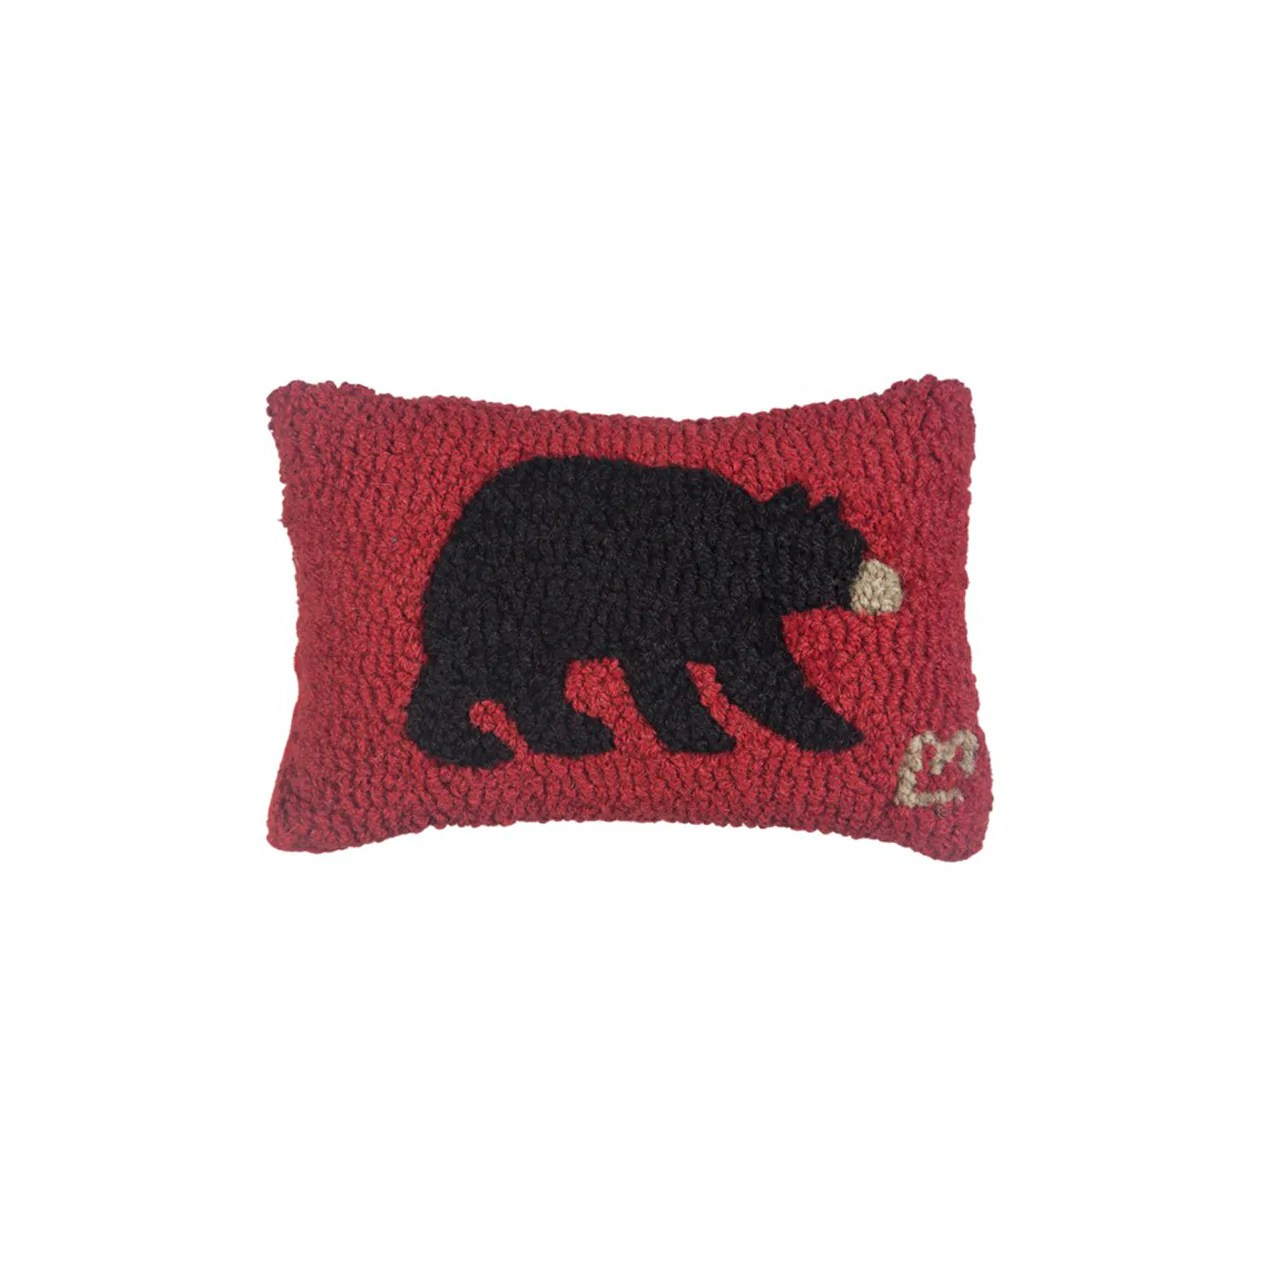 black bear pillow 8x12